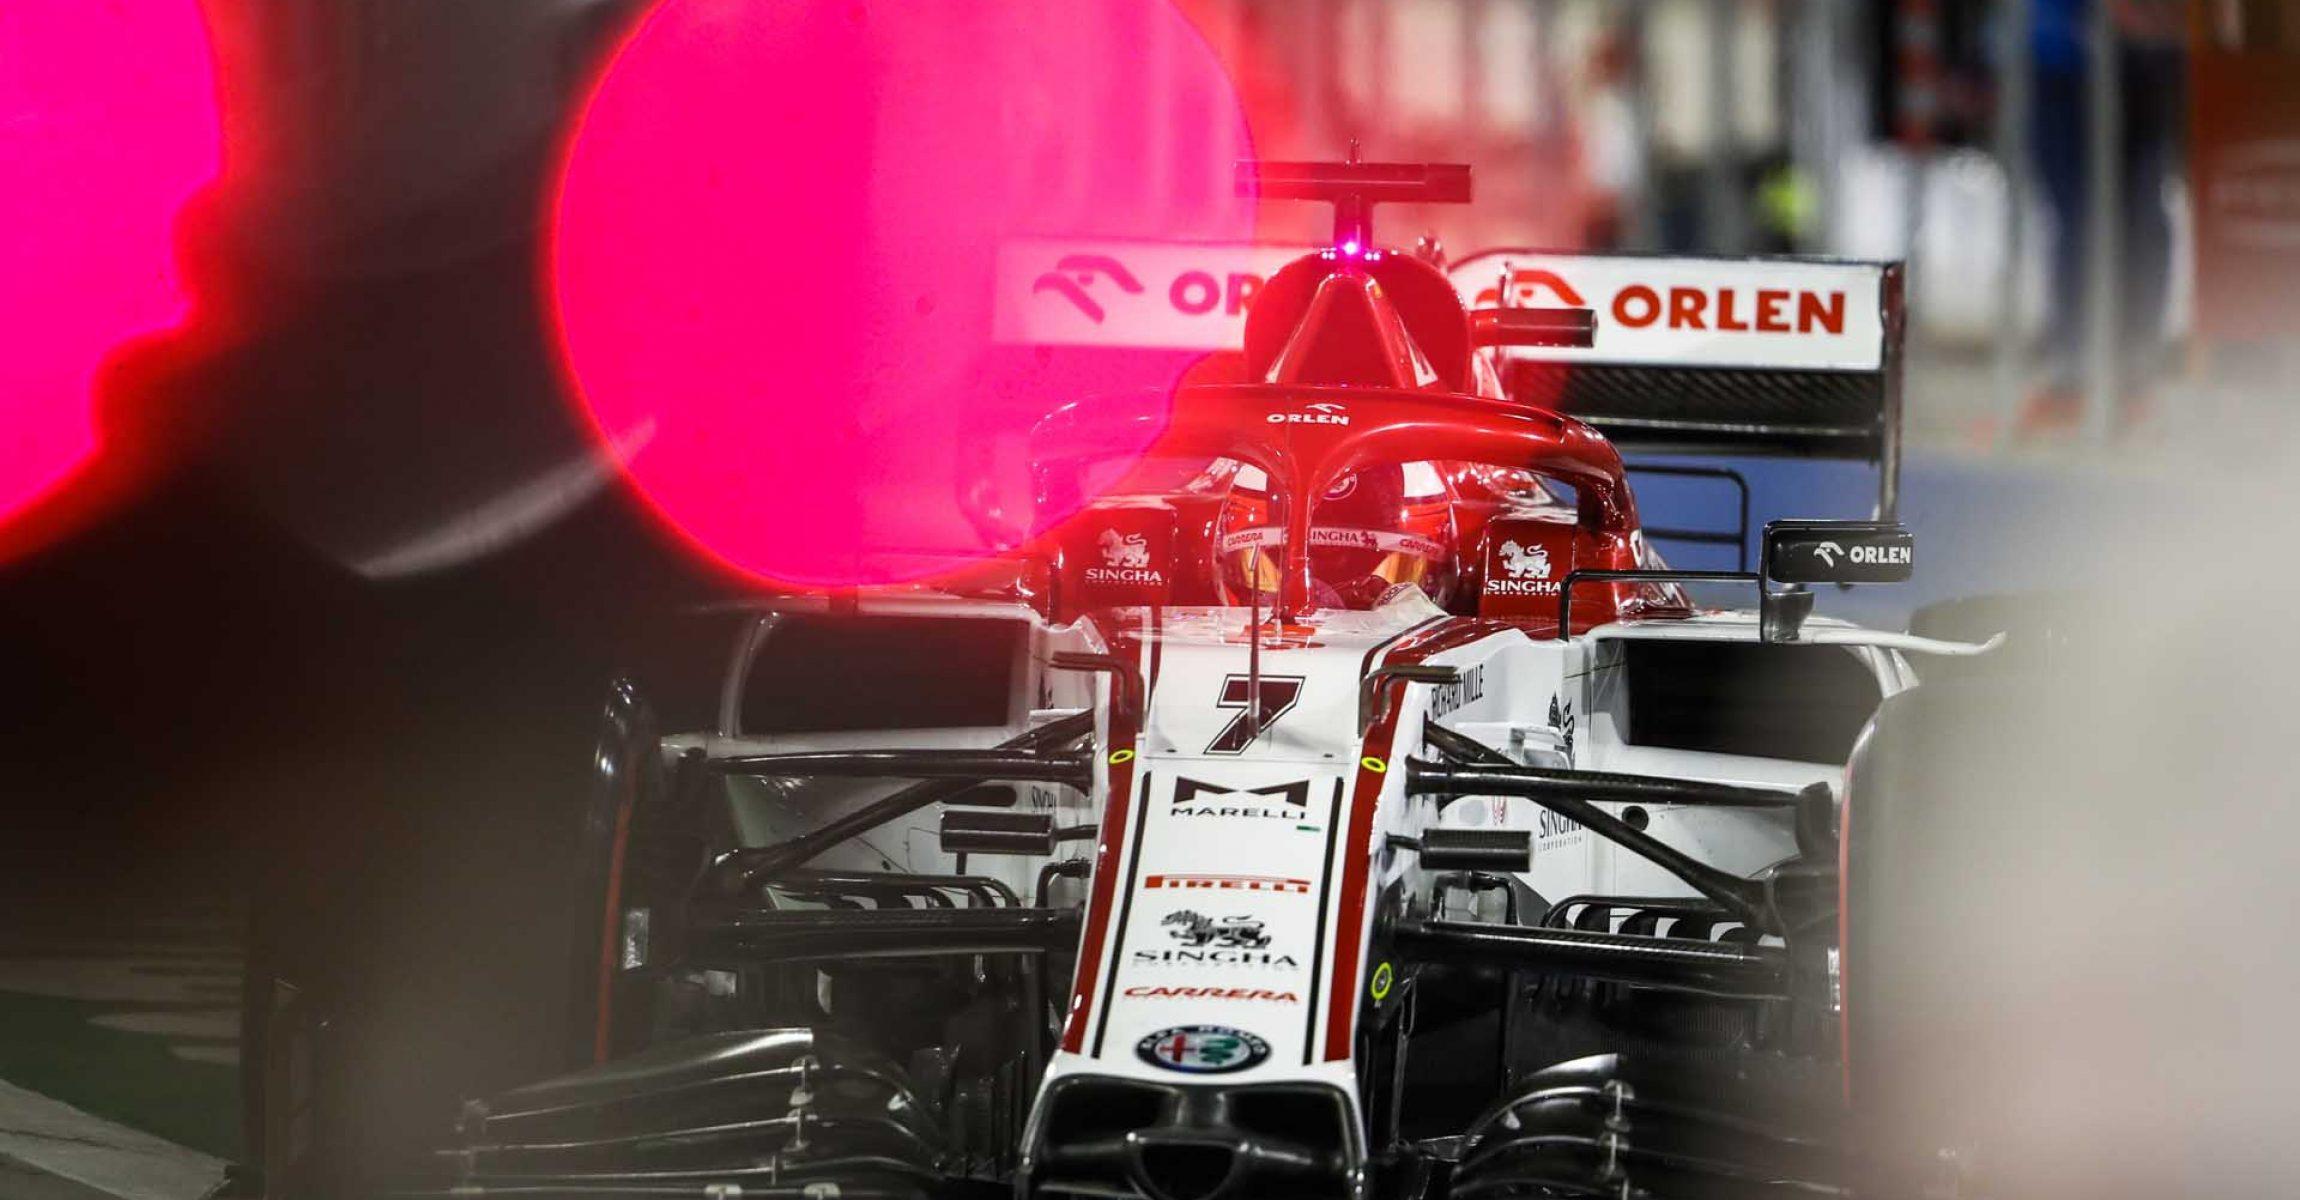 07 RAIKKONEN Kimi Räikkönen (fin), Alfa Romeo Racing ORLEN C39, action during the Formula 1 Gulf Air Bahrain Grand Prix 2020, from November 27 to 29, 2020 on the Bahrain International Circuit, in Sakhir, Bahrain - Photo Antonin Vincent / DPPI